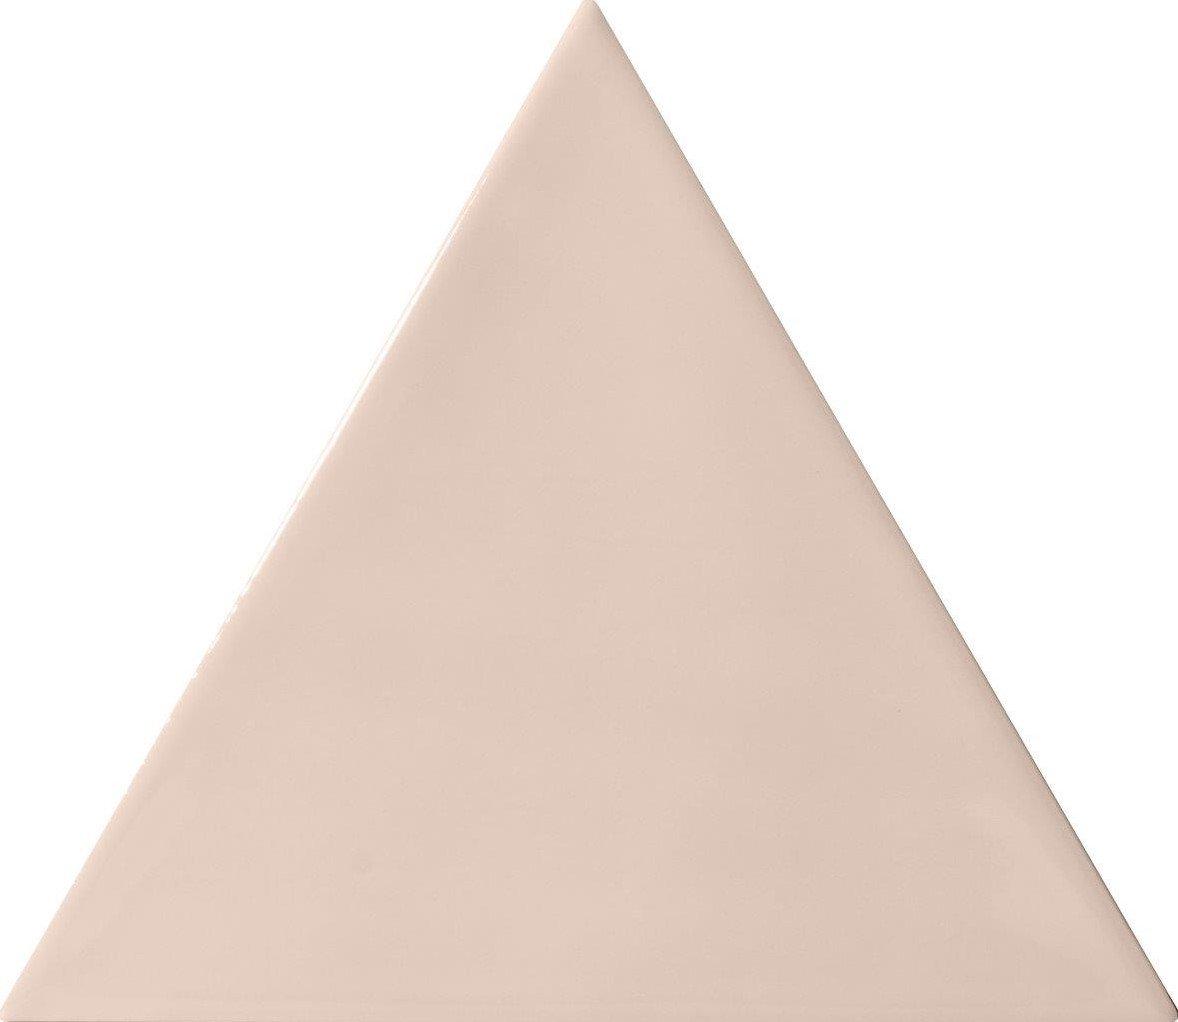 Quintessenza 3LATI driehoek tegel 13,2x11,4 Rosa Lucido